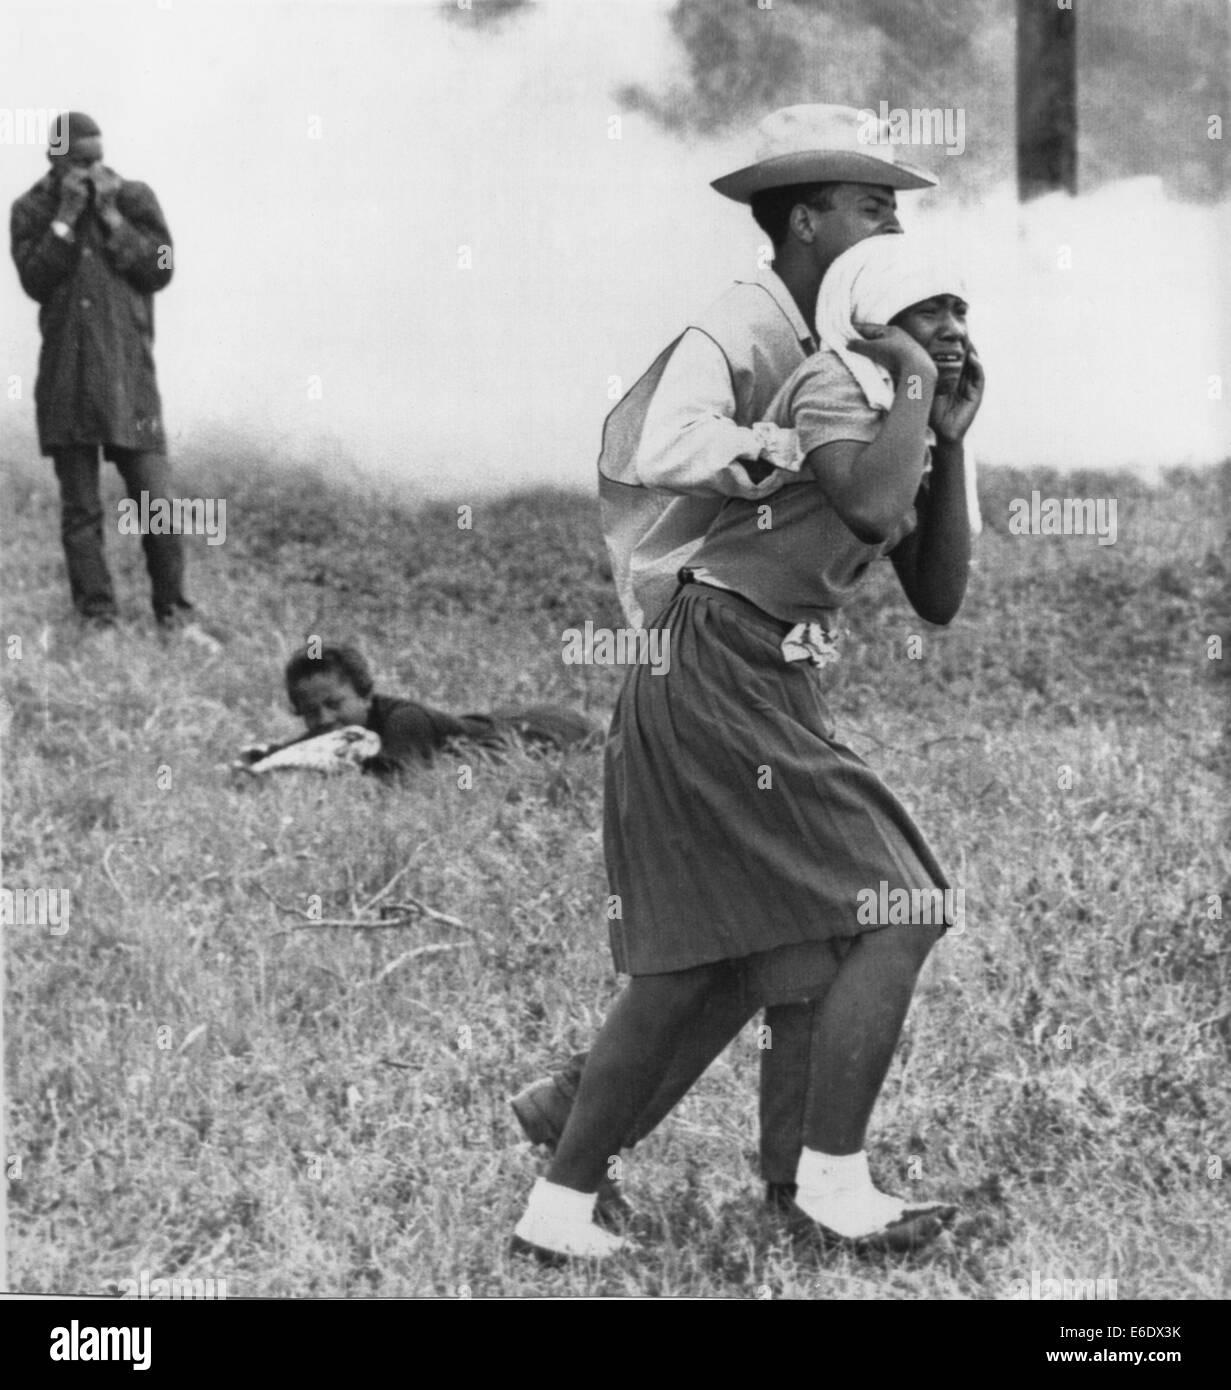 Civil Rights Demonstrator Helping Young Woman After Police Toss Smoke Bombs, Camden, Alabama, USA, 1965 - Stock Image